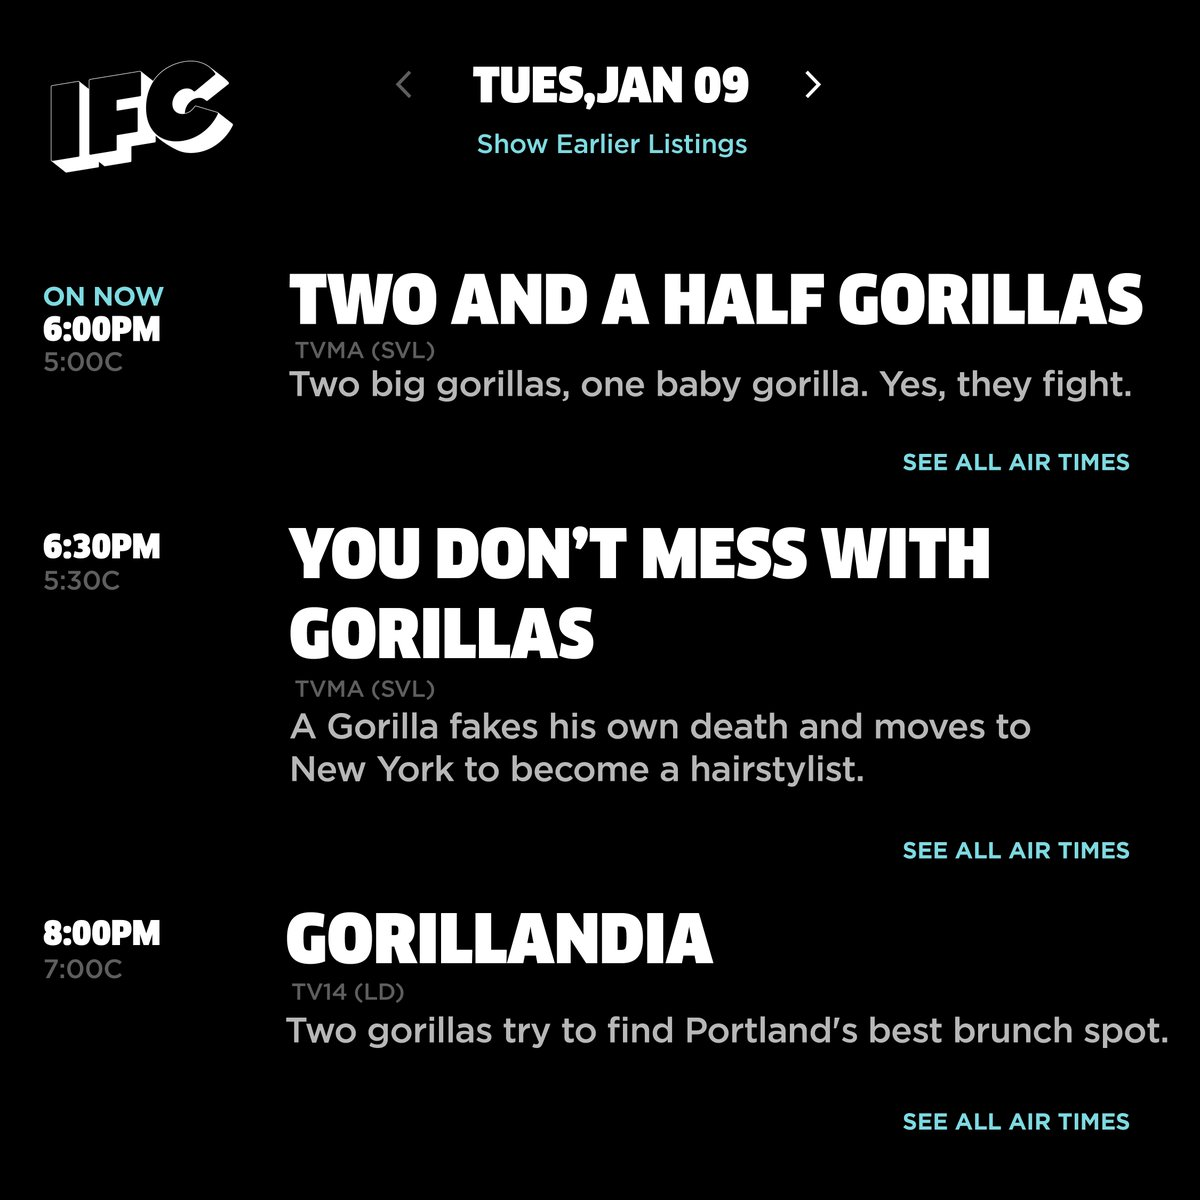 Last minute programming change. 🦍 #gorillachannel https://t.co/wRkEpMzi5C